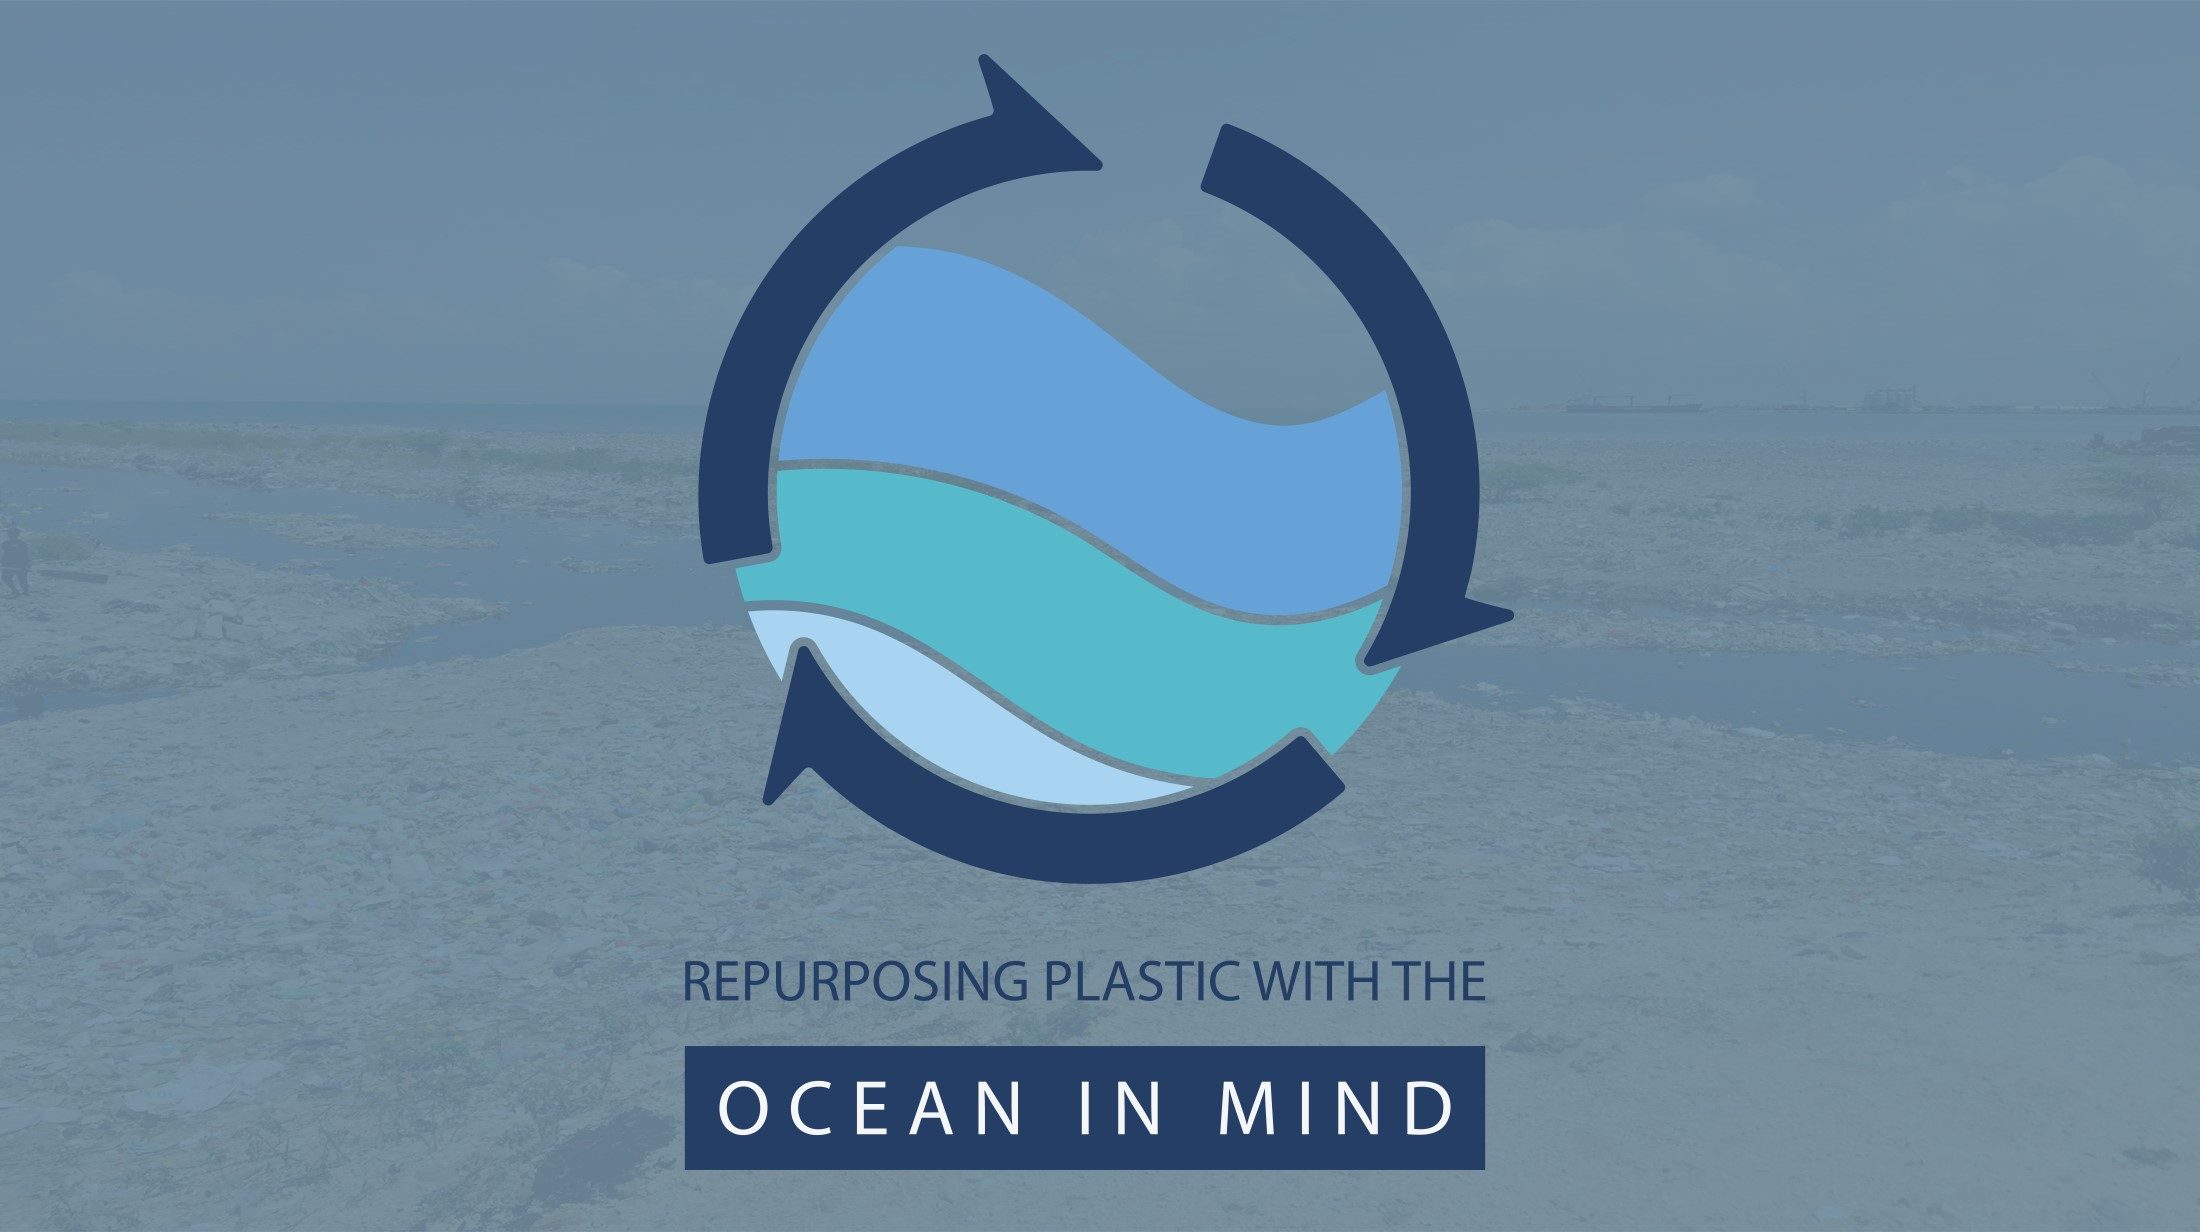 ORBIS Launches New Sustainability Initiative to Repurpose Coastline Waste